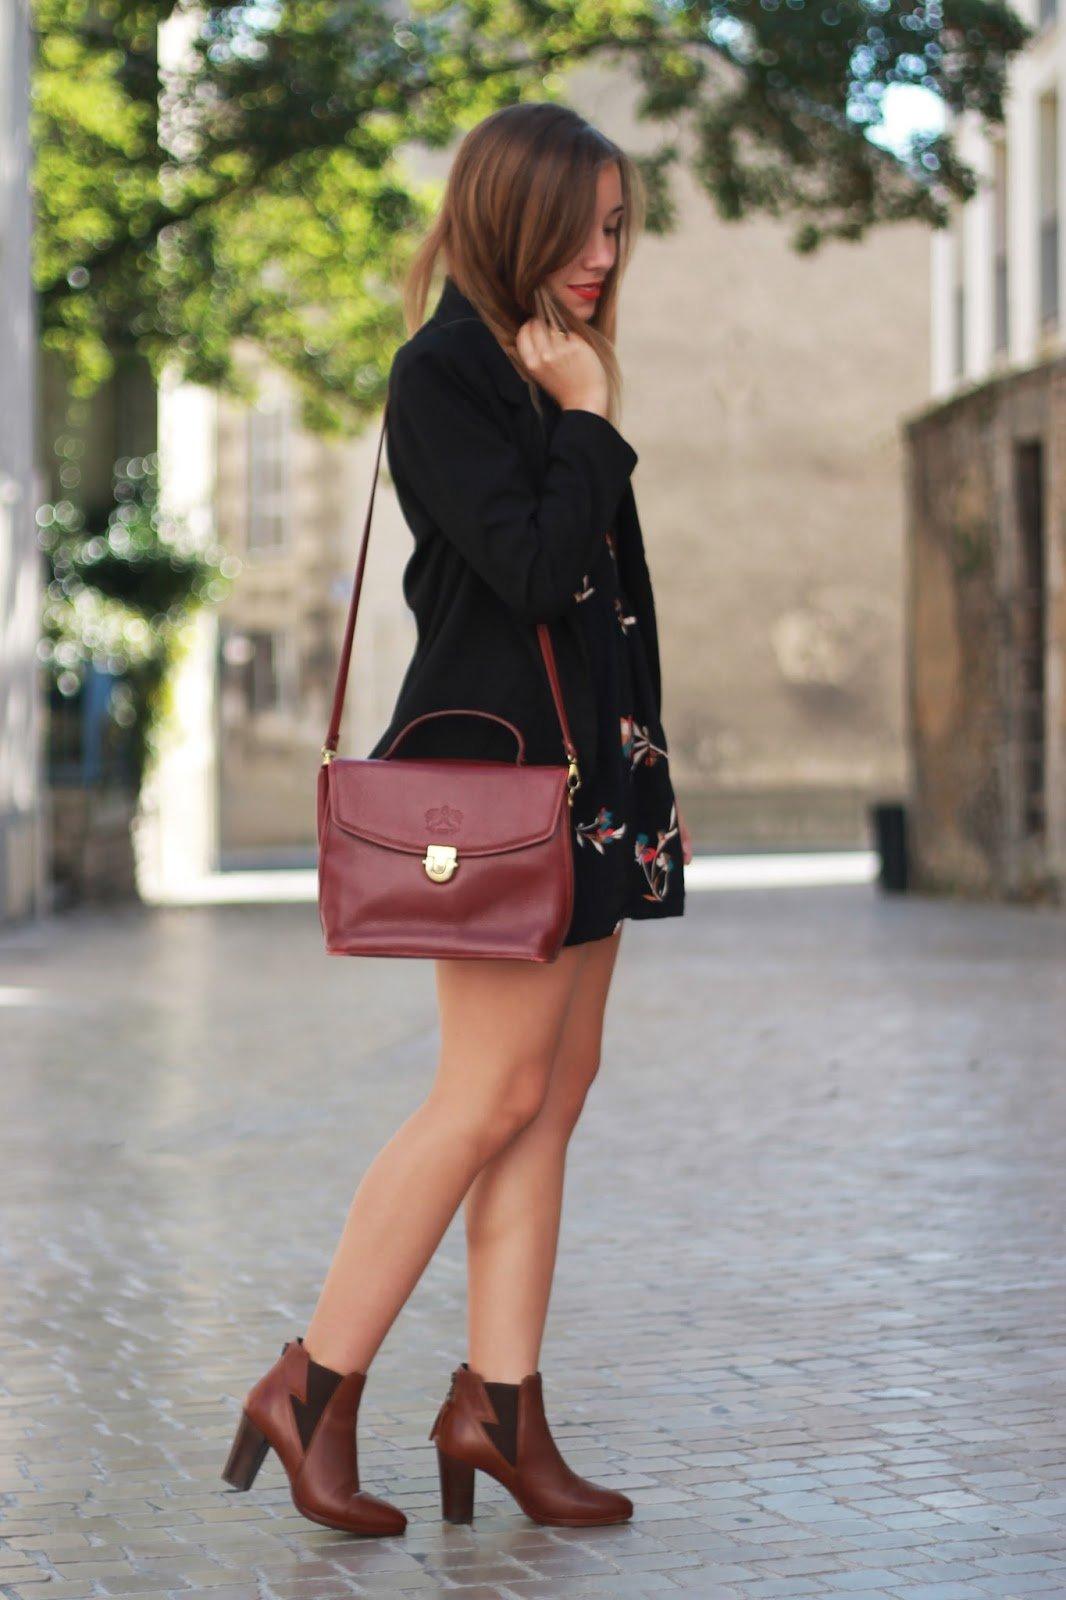 Chaussures tendance automne